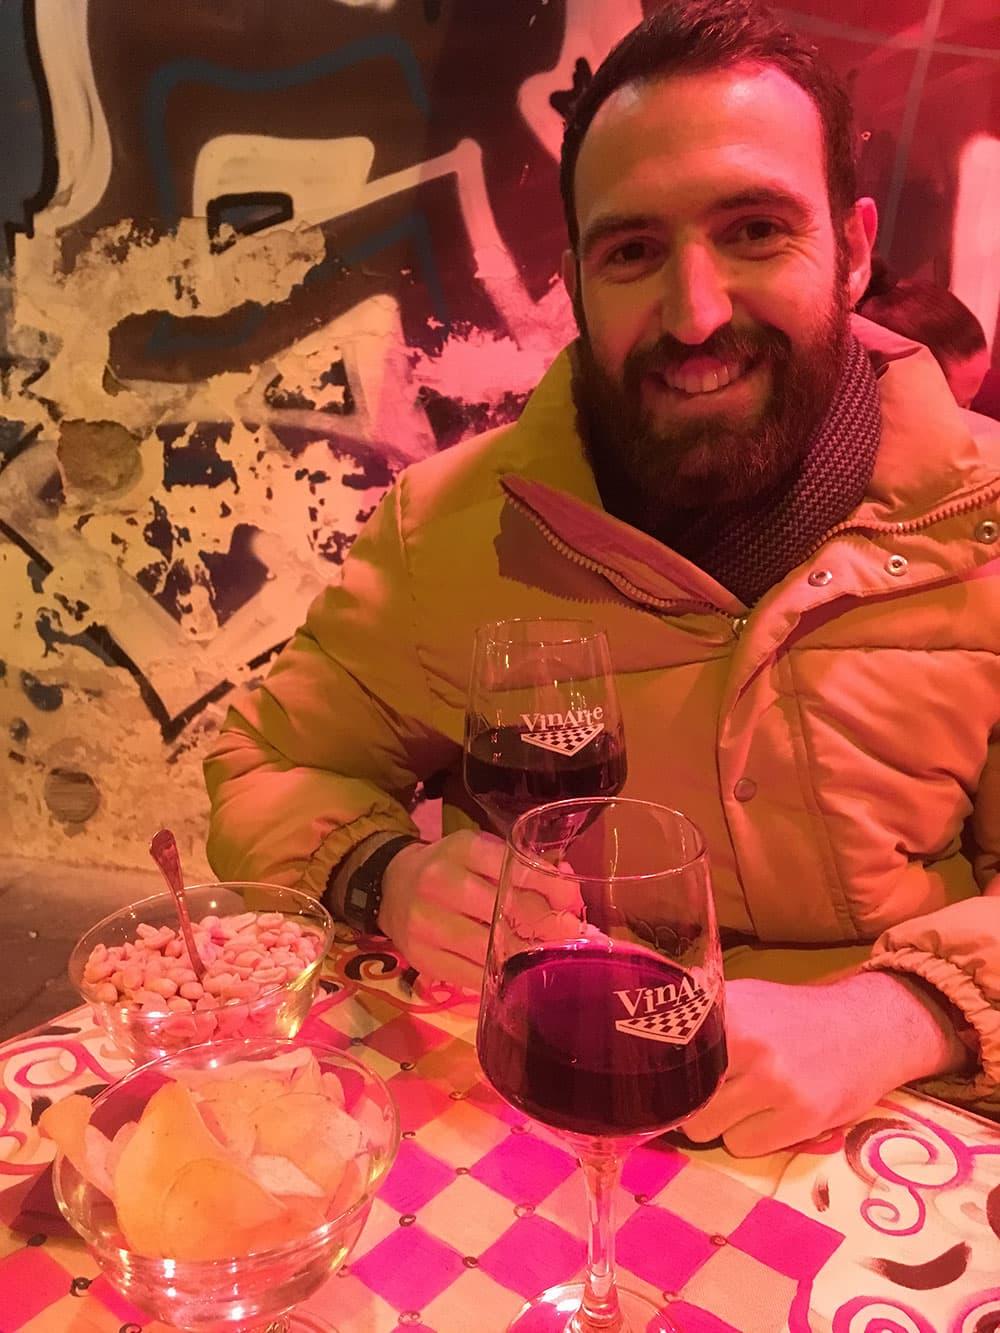 Enjoying a glass of wine at Vinarte (Piazza Bellini)